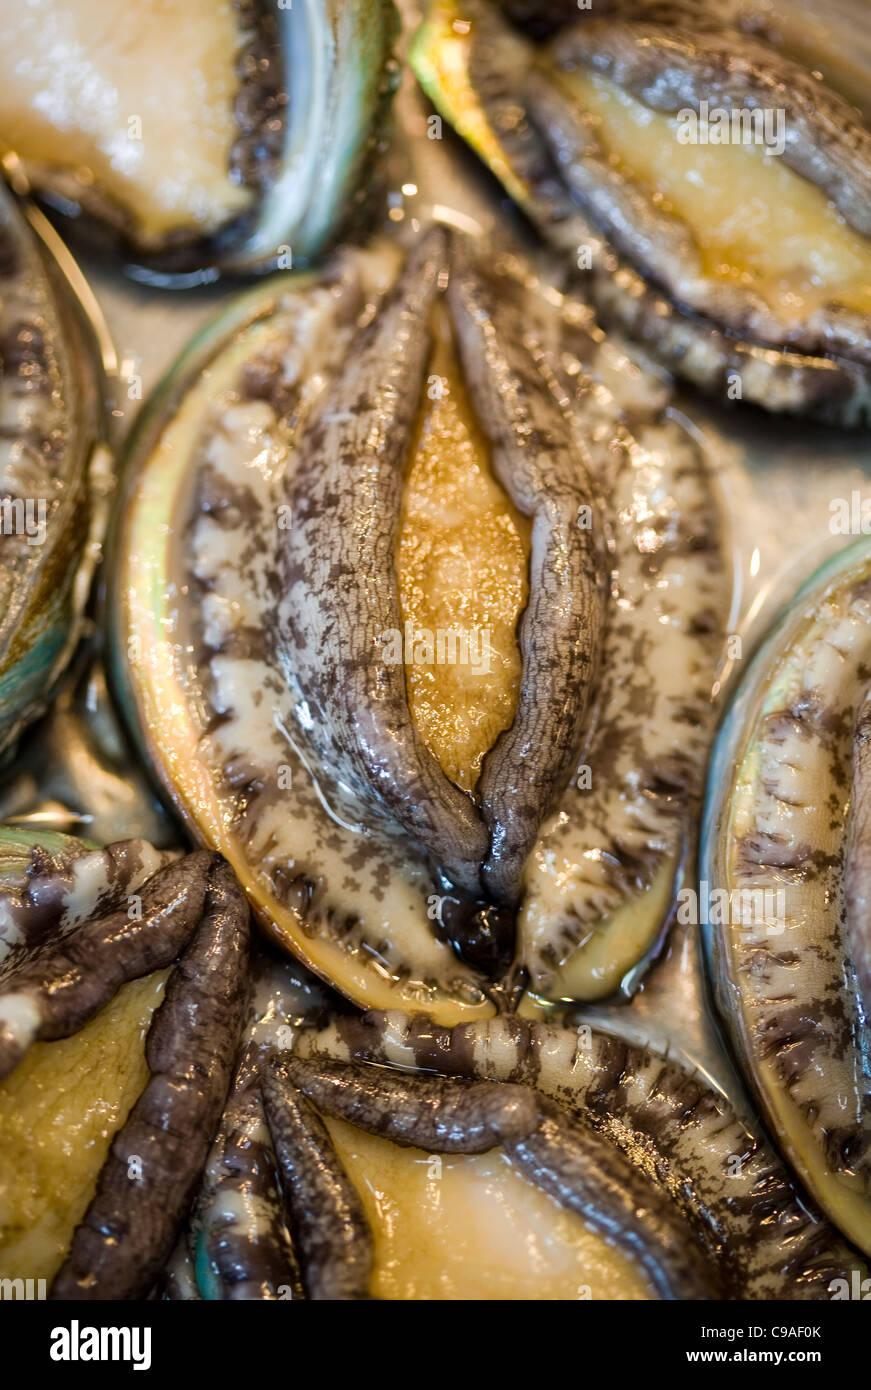 Abalone on sale at Jagalchi Fish Market Busan South Korea Stock Photo. Royalty Free Image: 40183939 - Alamy